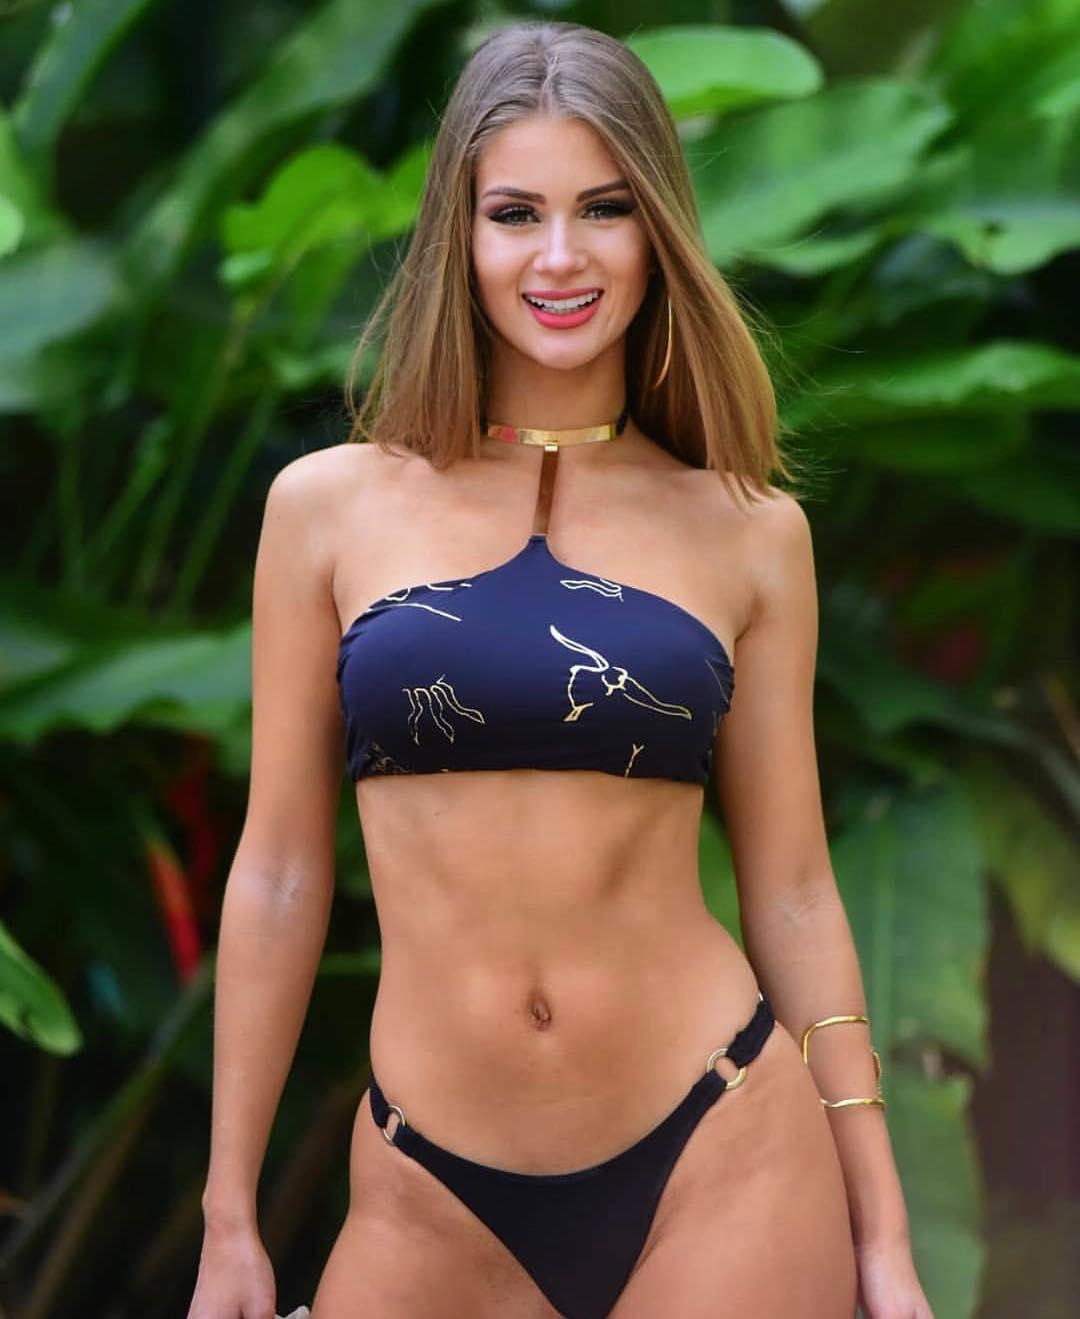 gabriela palma, miss brasil empresarial 2018. - Página 4 38299312